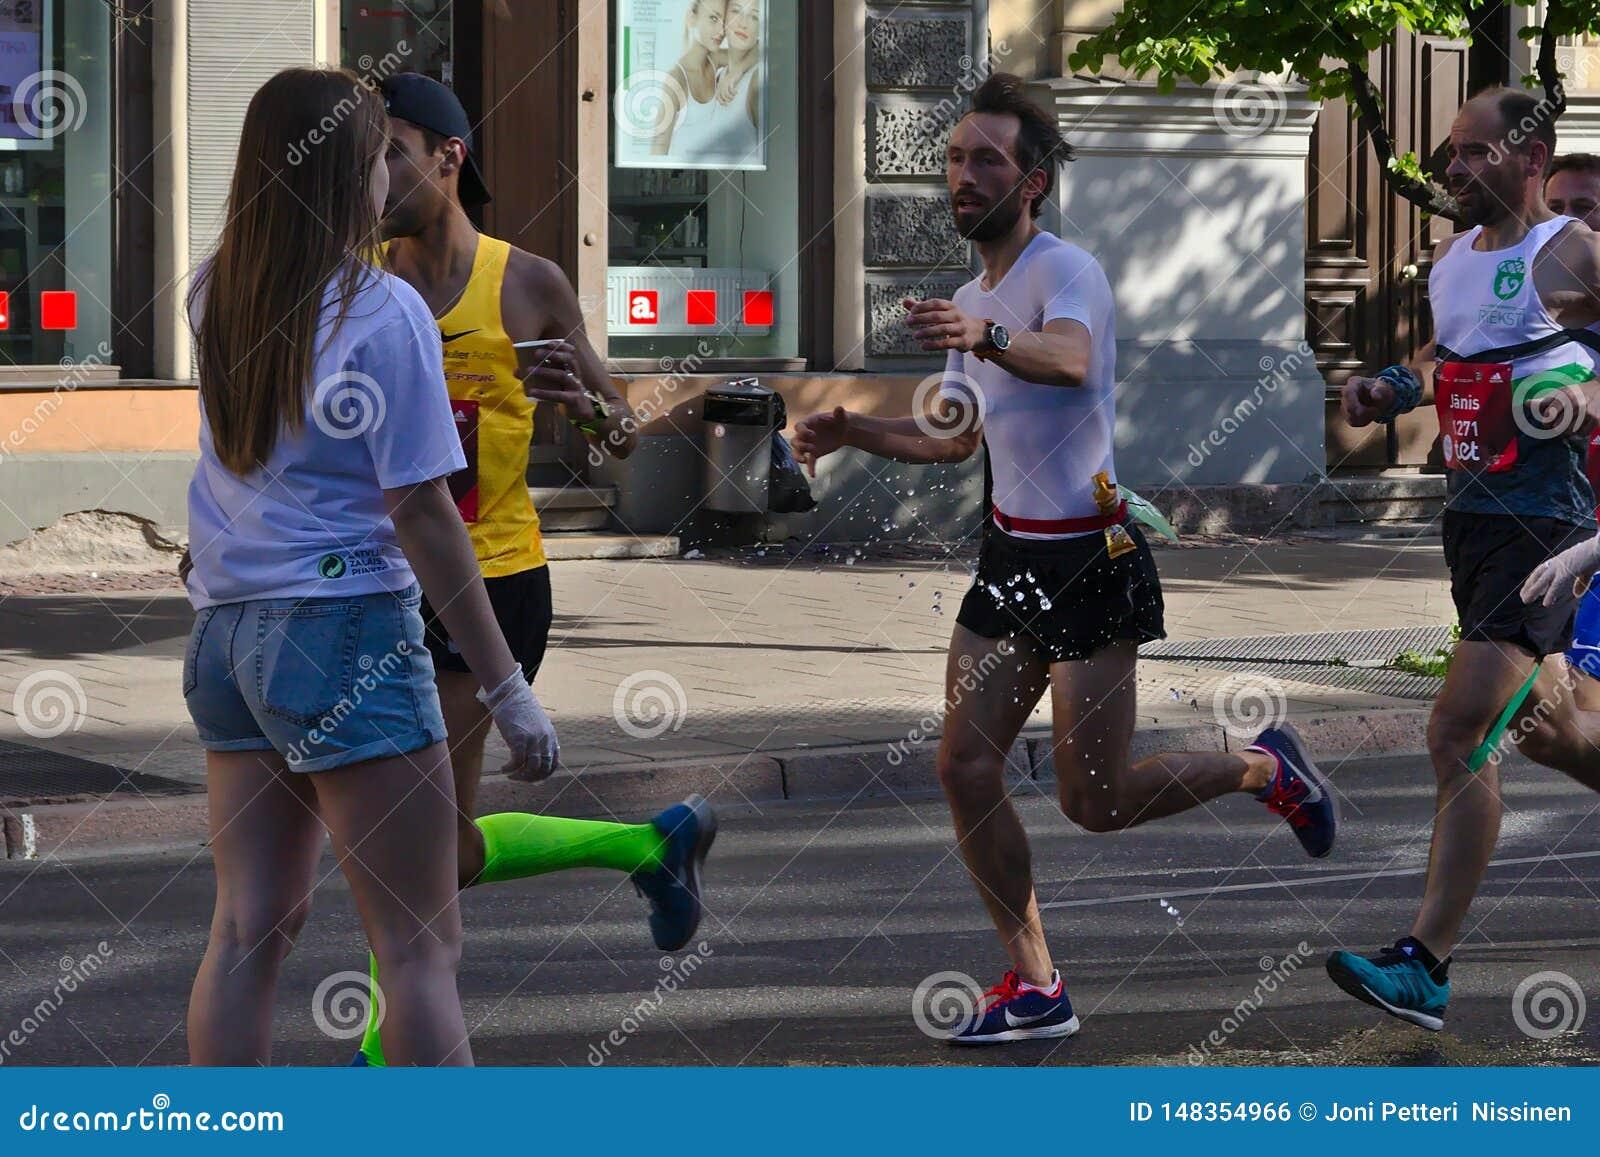 Riga, Latvia - May 19 2019: Man with beard reaching for refreshment